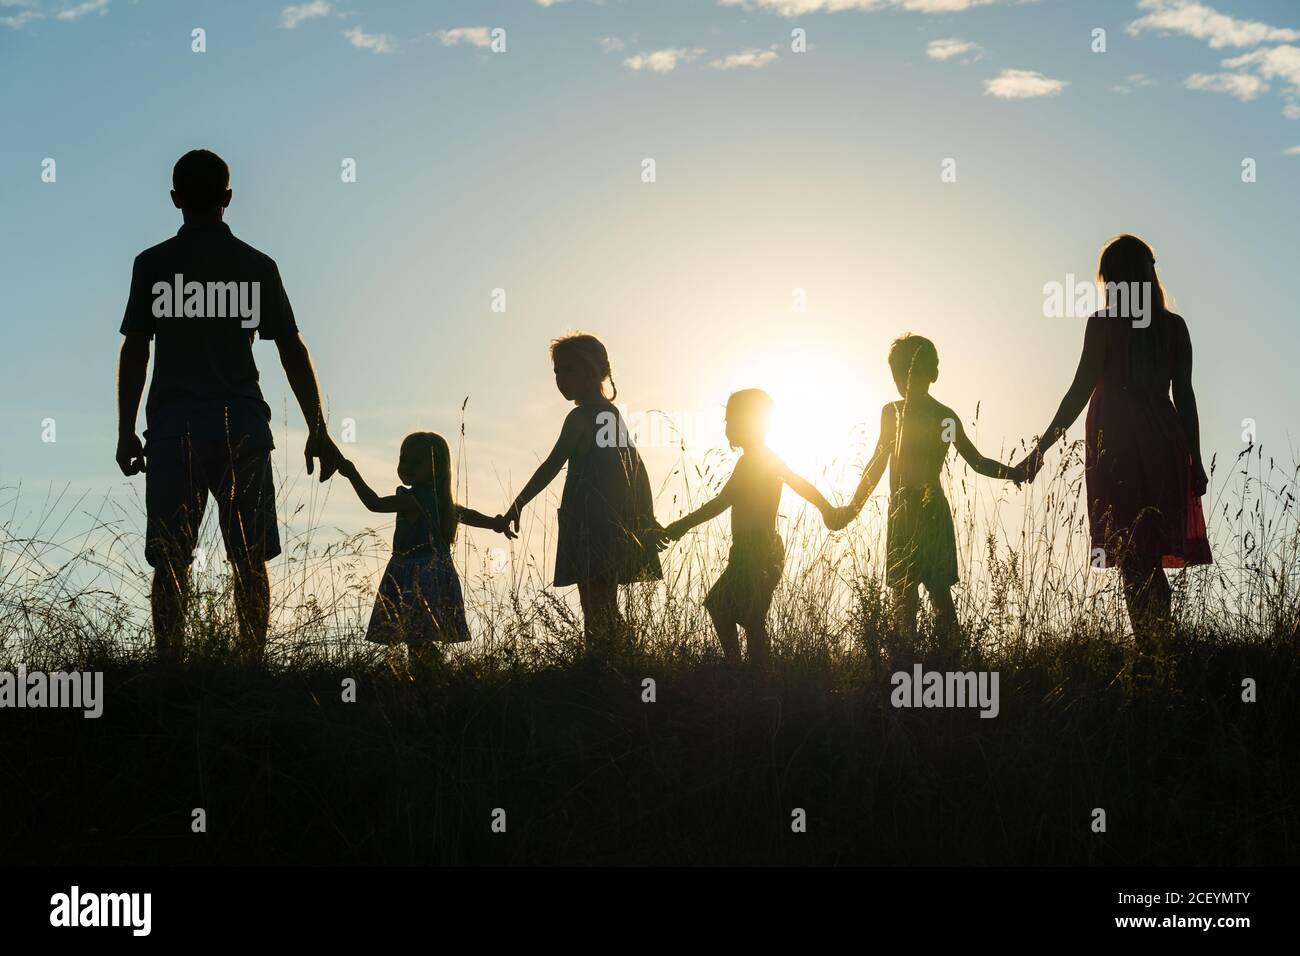 Silueta de una familia grande feliz al atardecer. Foto de stock